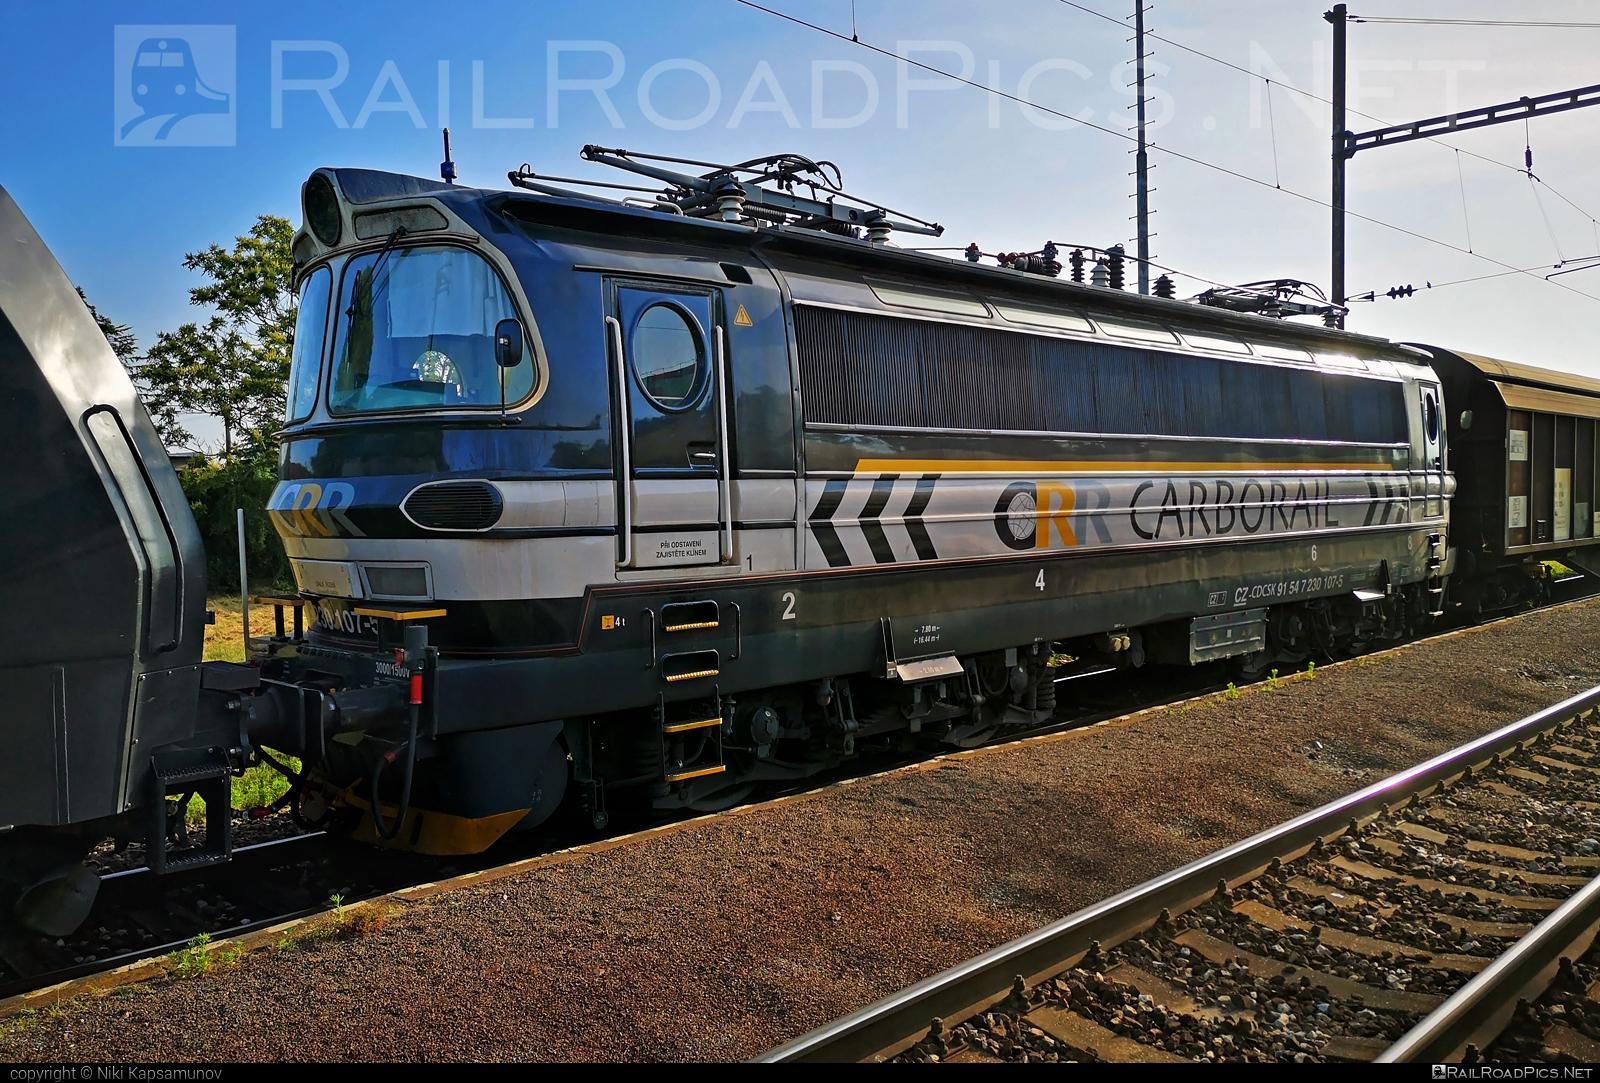 Škoda 47E - 230 107-5 operated by Carbo Rail, s.r.o. #cdcargoslovakia #cdcsk #laminatka #locomotive240 #skoda #skoda47e